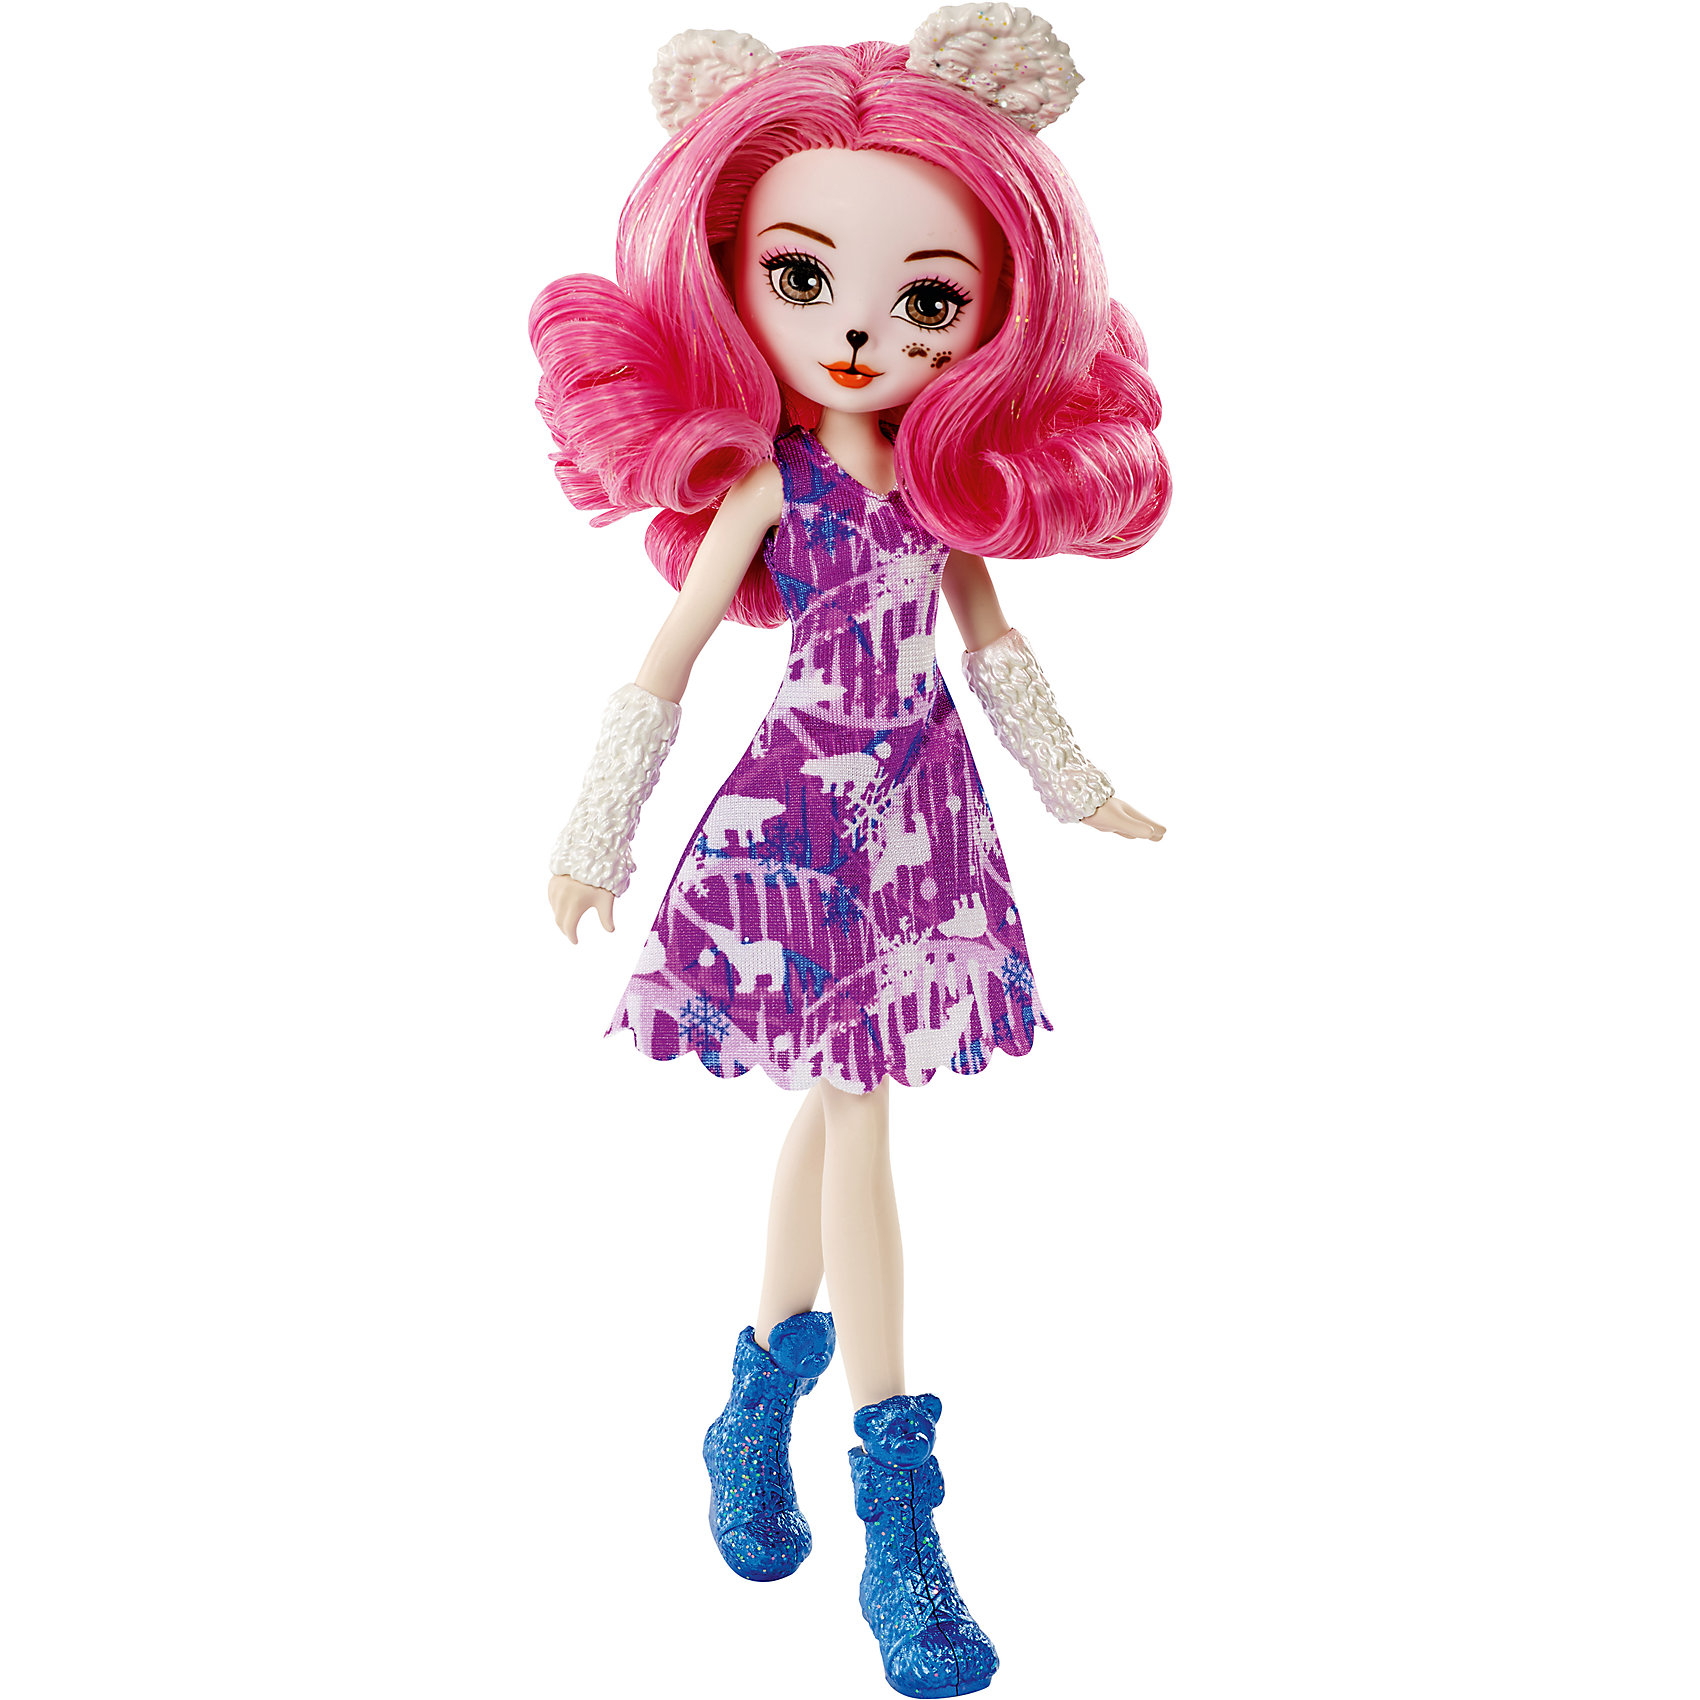 Mattel Кукла-пикси Вероникуб из коллекции Заколдованная зима, Ever After High mattel кукла эппл уайт ever after high